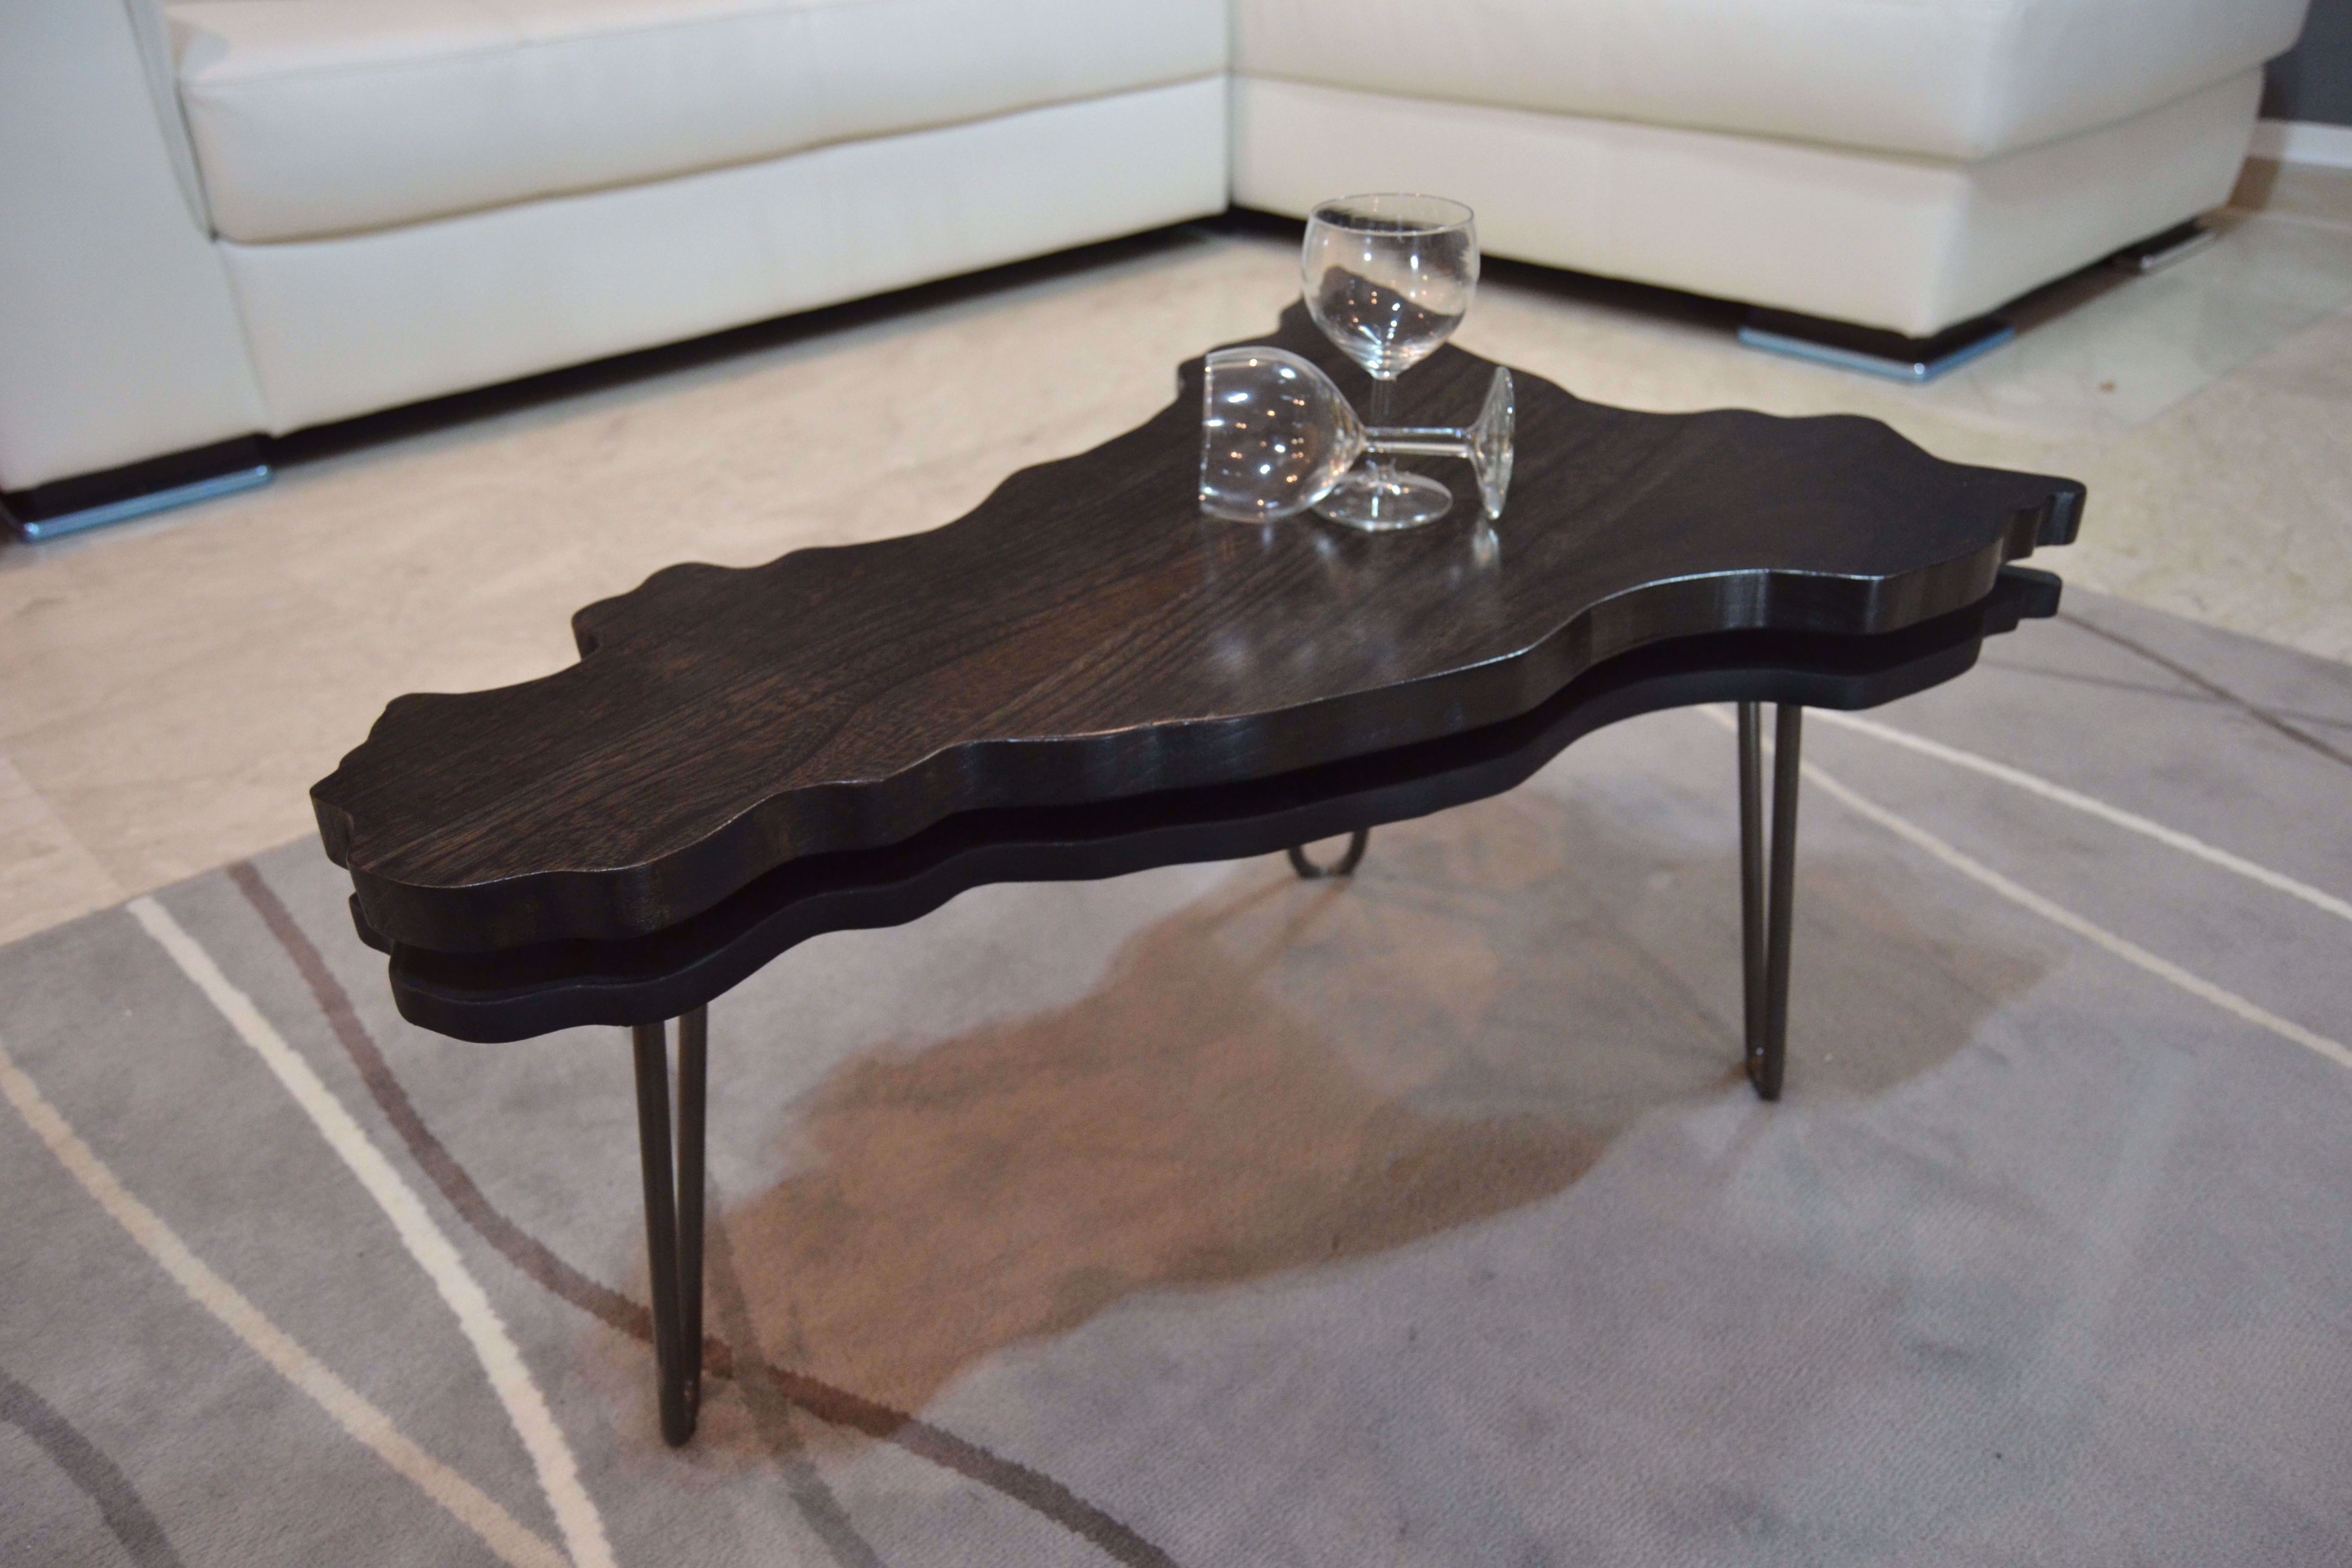 Tavolino Salotto Moderno Design Unico Tavolino Salotto Tavolini Salotto Tavolino Da Salotto Tavolini Da Salott In 2020 Living Room Images Coffee Table Living Room Tv